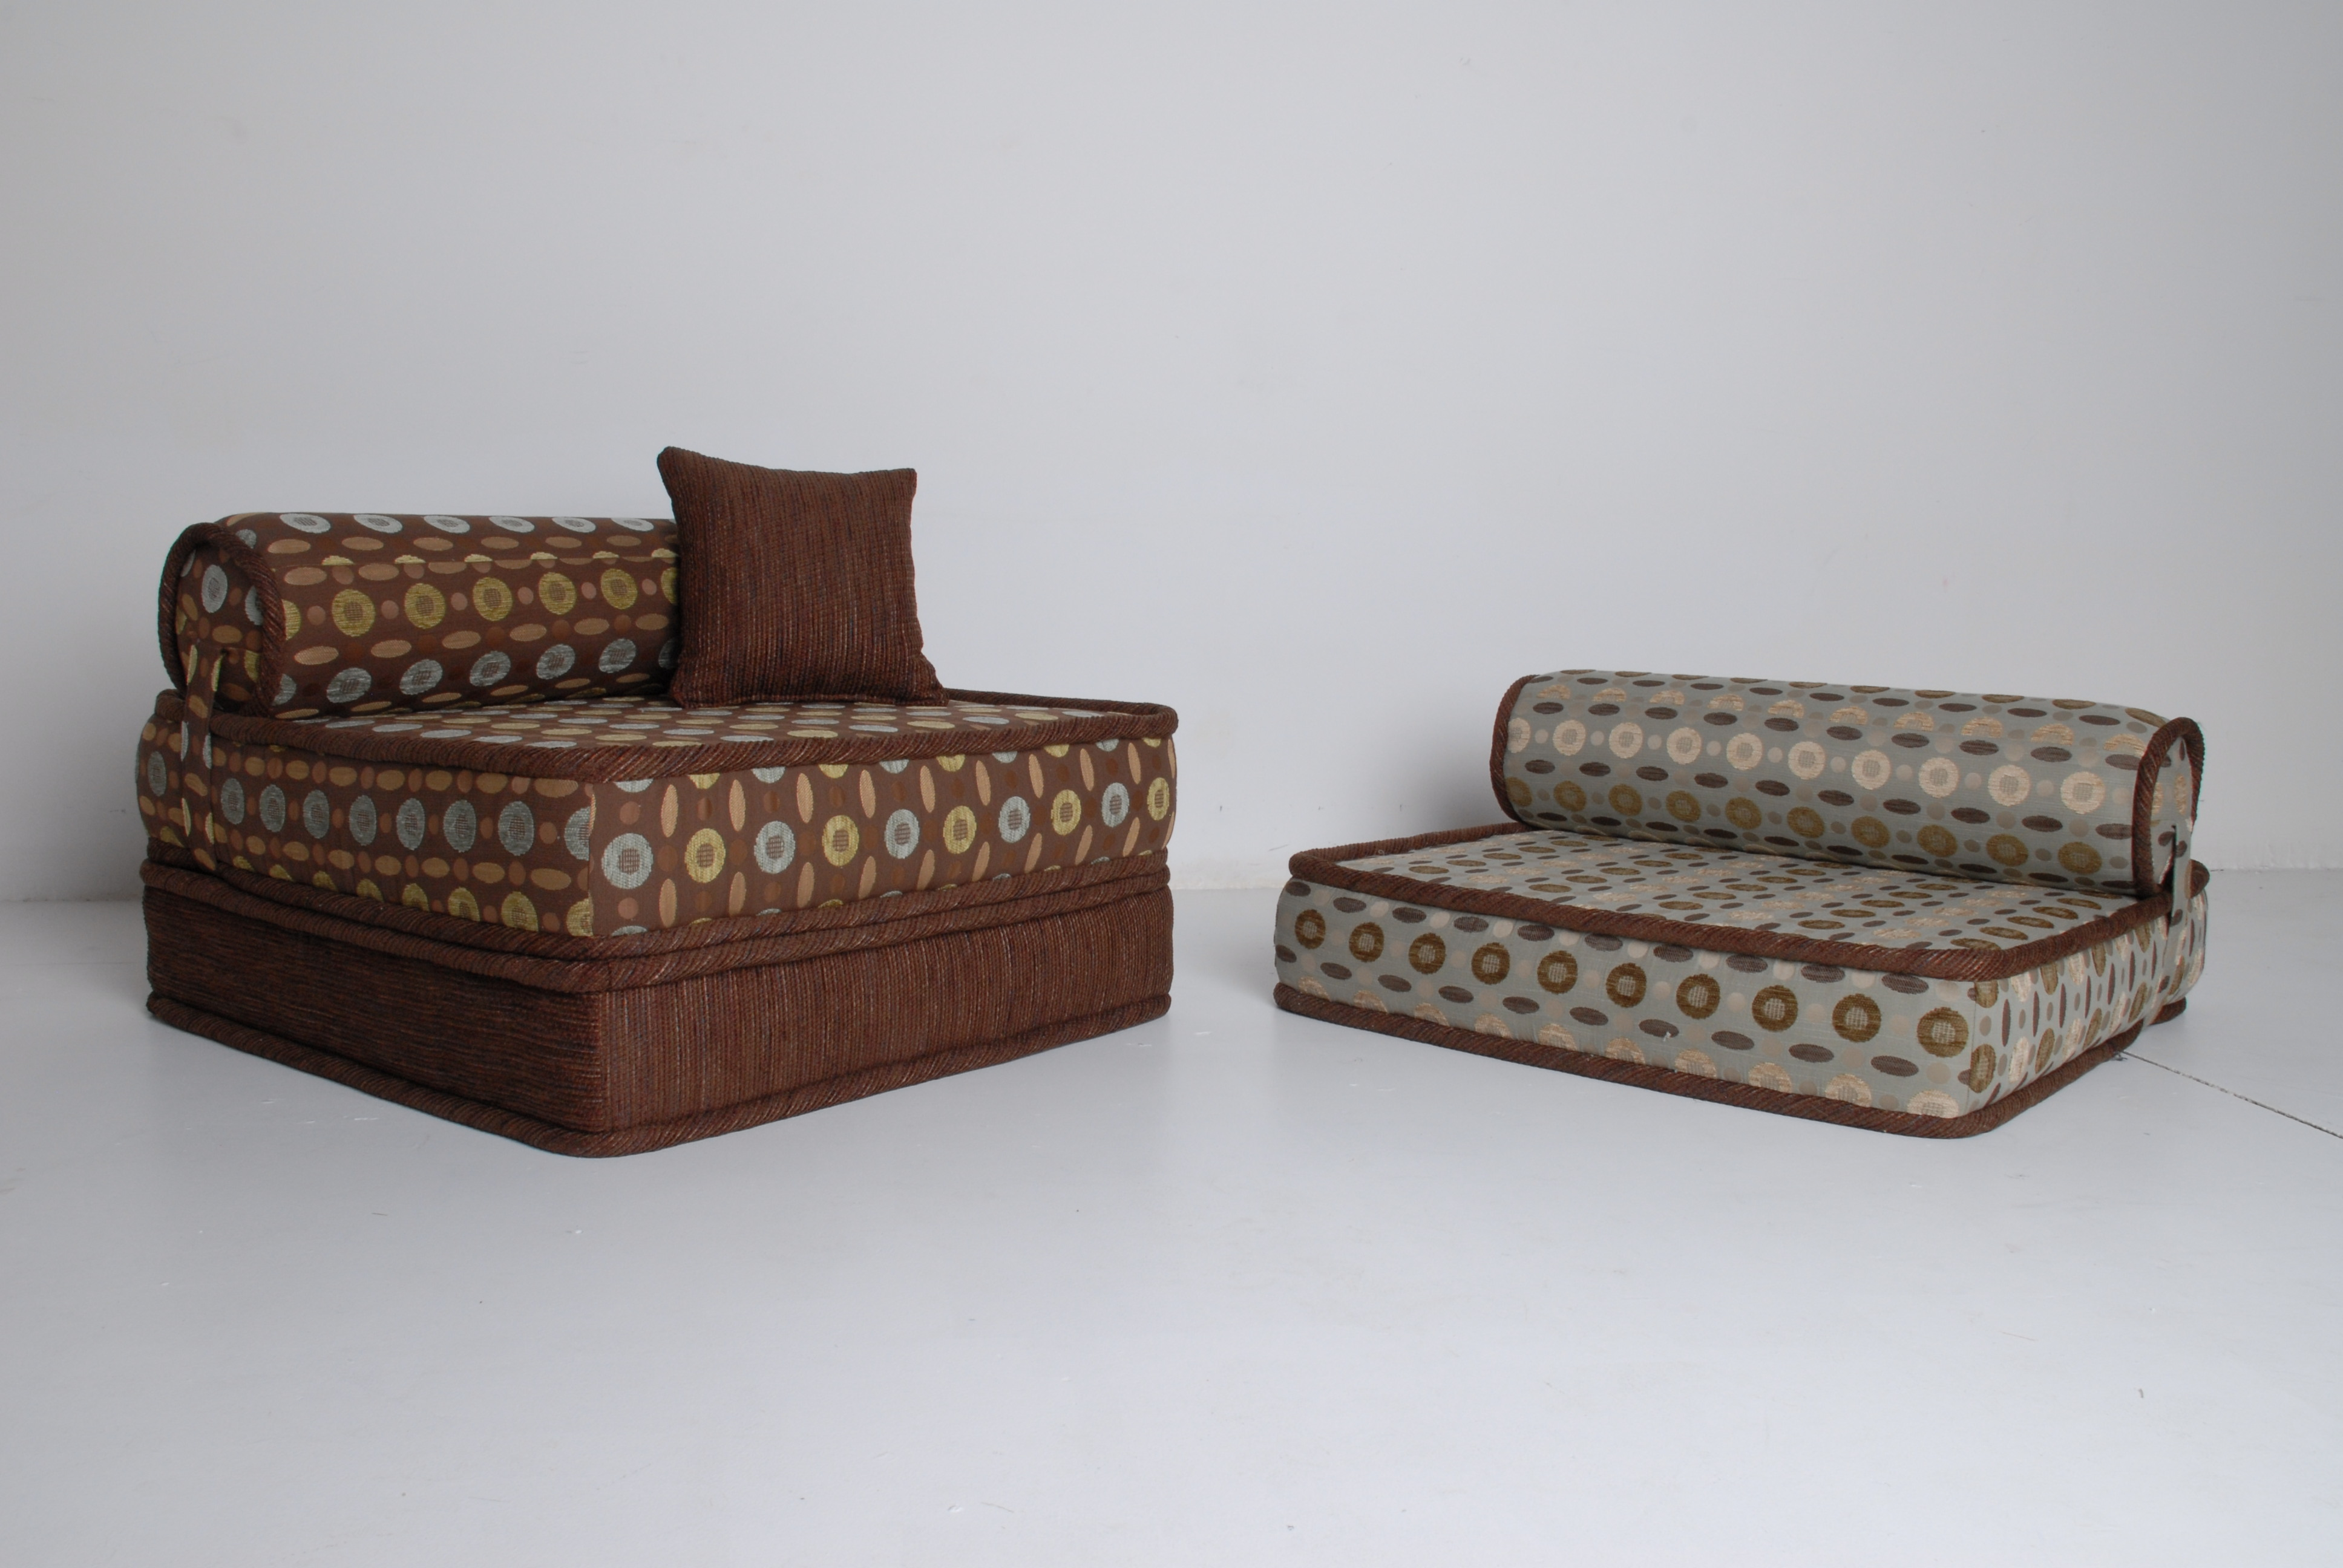 Furniture By Melissa Coffey At Coroflot.com